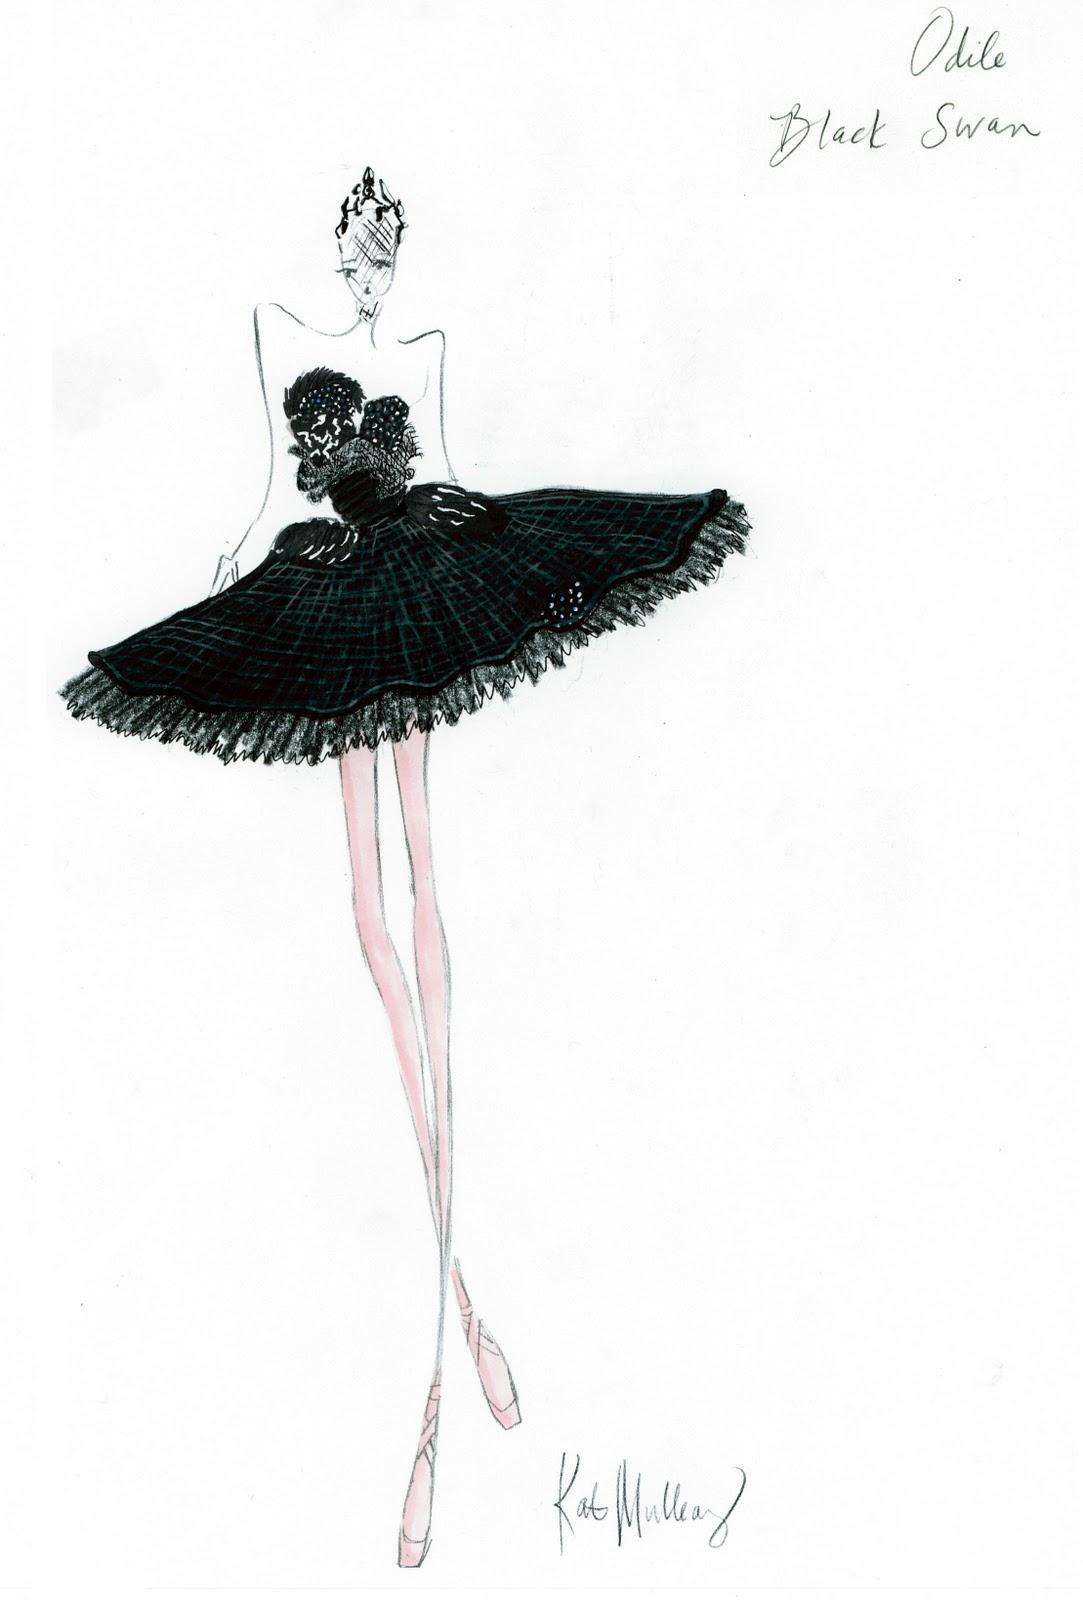 http://2.bp.blogspot.com/_gB4P-V-QuHo/TSX2F7qAcTI/AAAAAAAAAts/-NBgmc8g0YA/s1600/black+swan+sketch.jpg